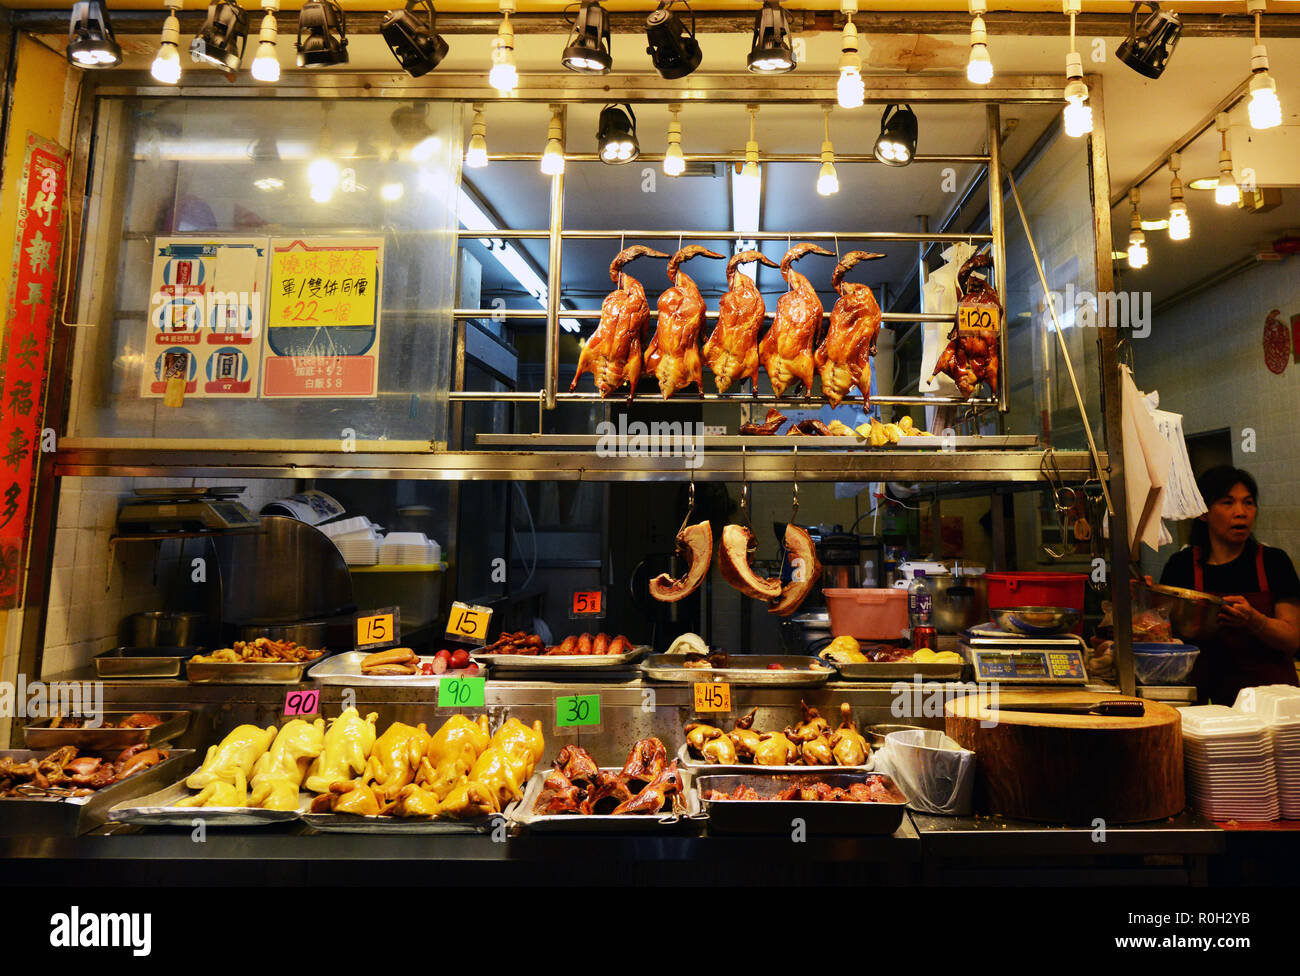 A Cantonese / Hong Kong restaurant in Mong Kok, Hong Kong. - Stock Image